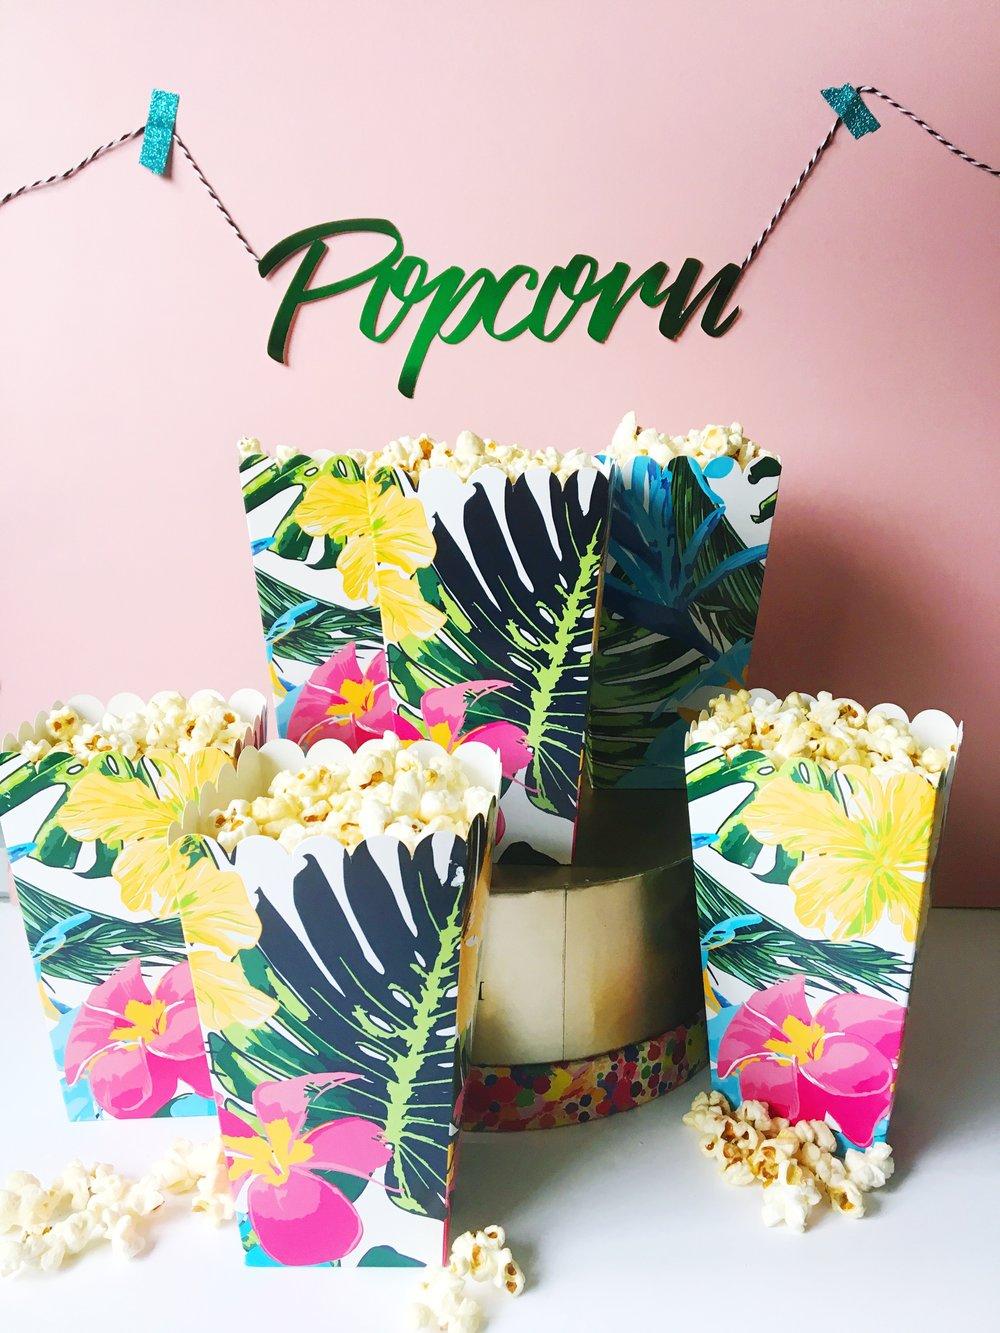 Pop-up popcorn wedding bar station